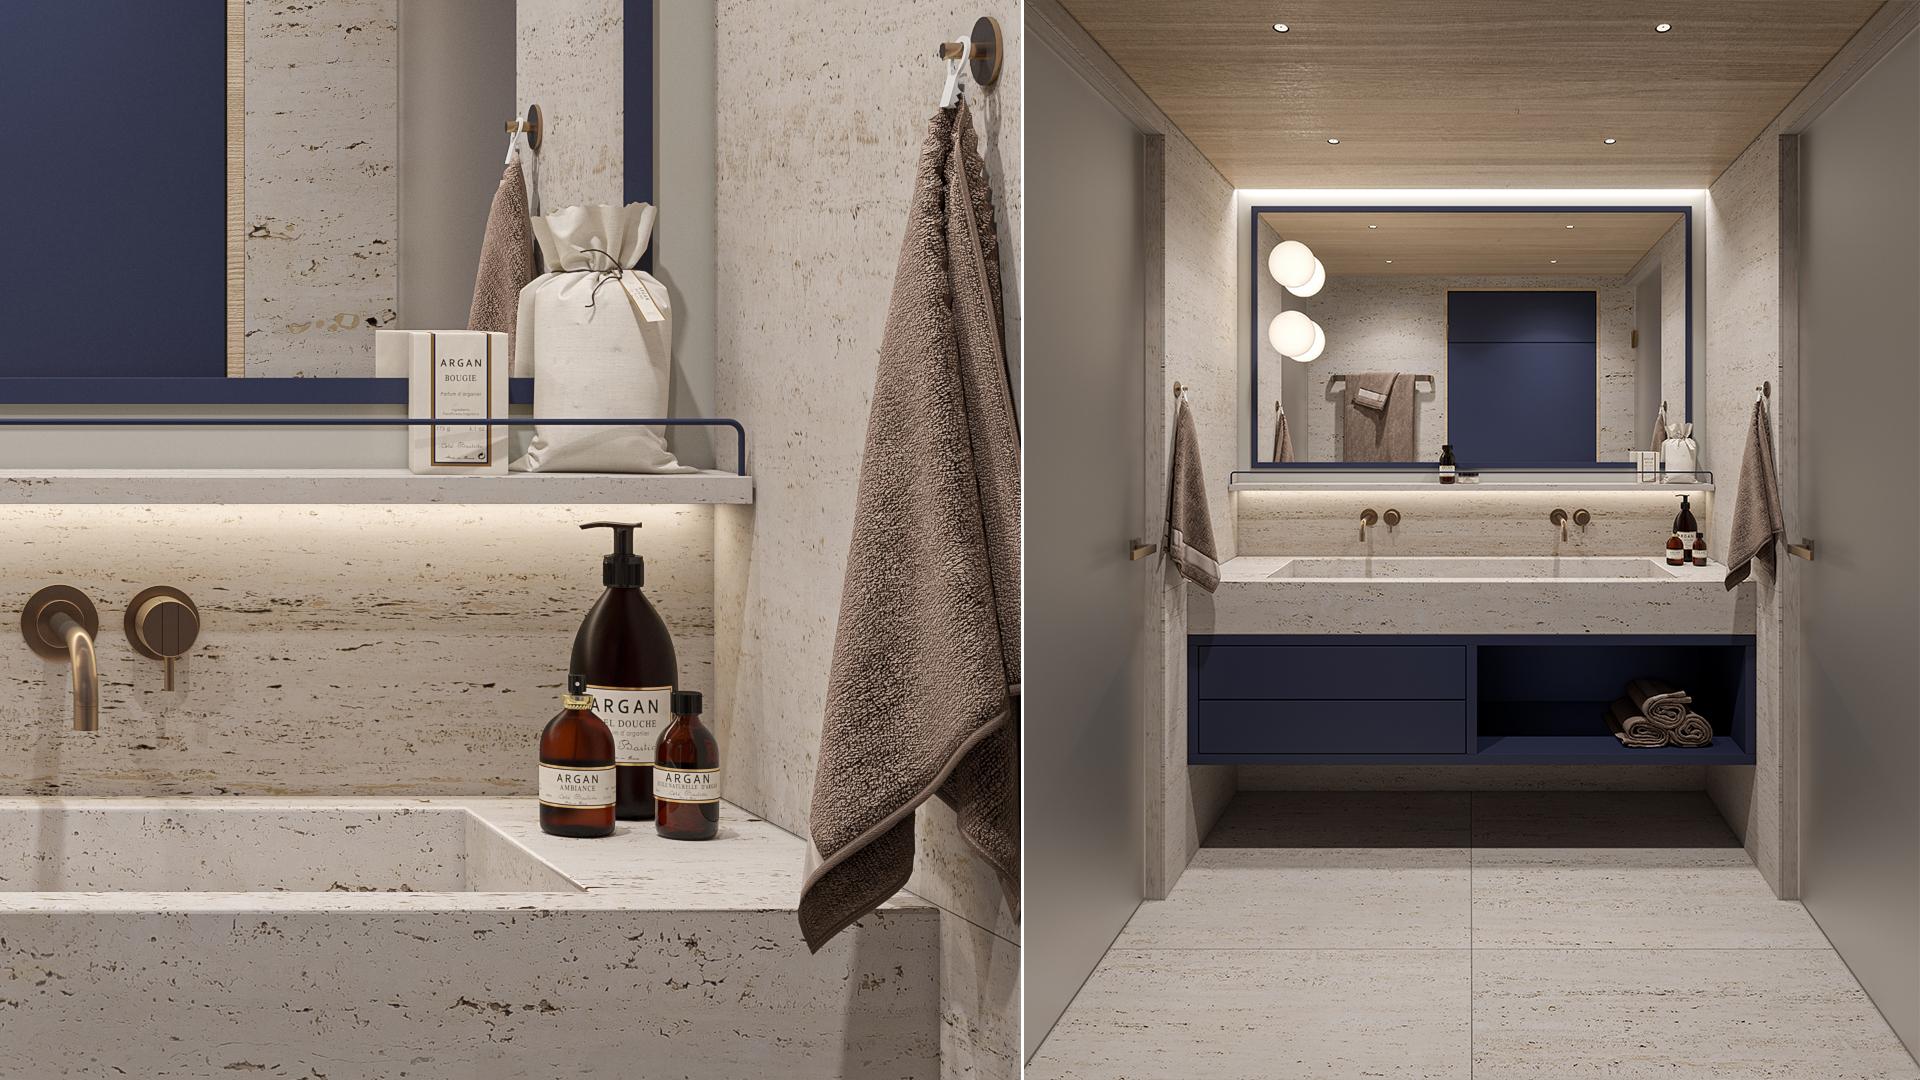 Maayan-Golan_Architectural-Visualization_interior-visualization_yacht-design_bathroom_design-by-rust_04